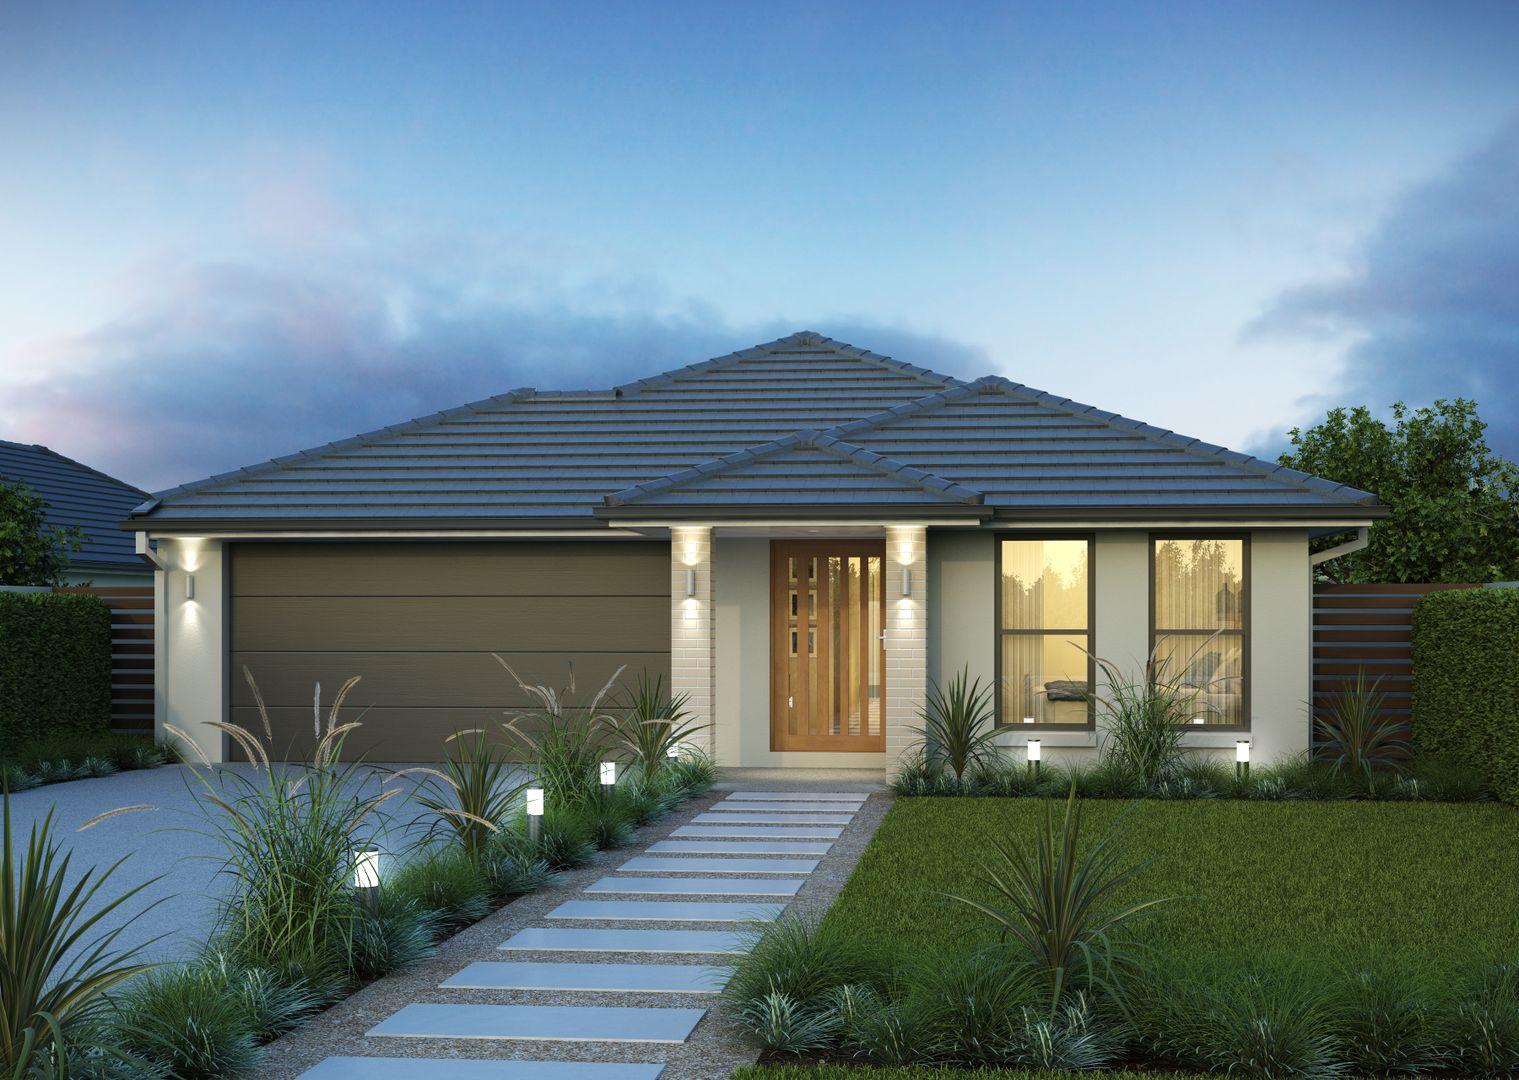 Lot 142 Bluegrass Drive, Ridge View Estate, Narangba QLD 4504, Image 0